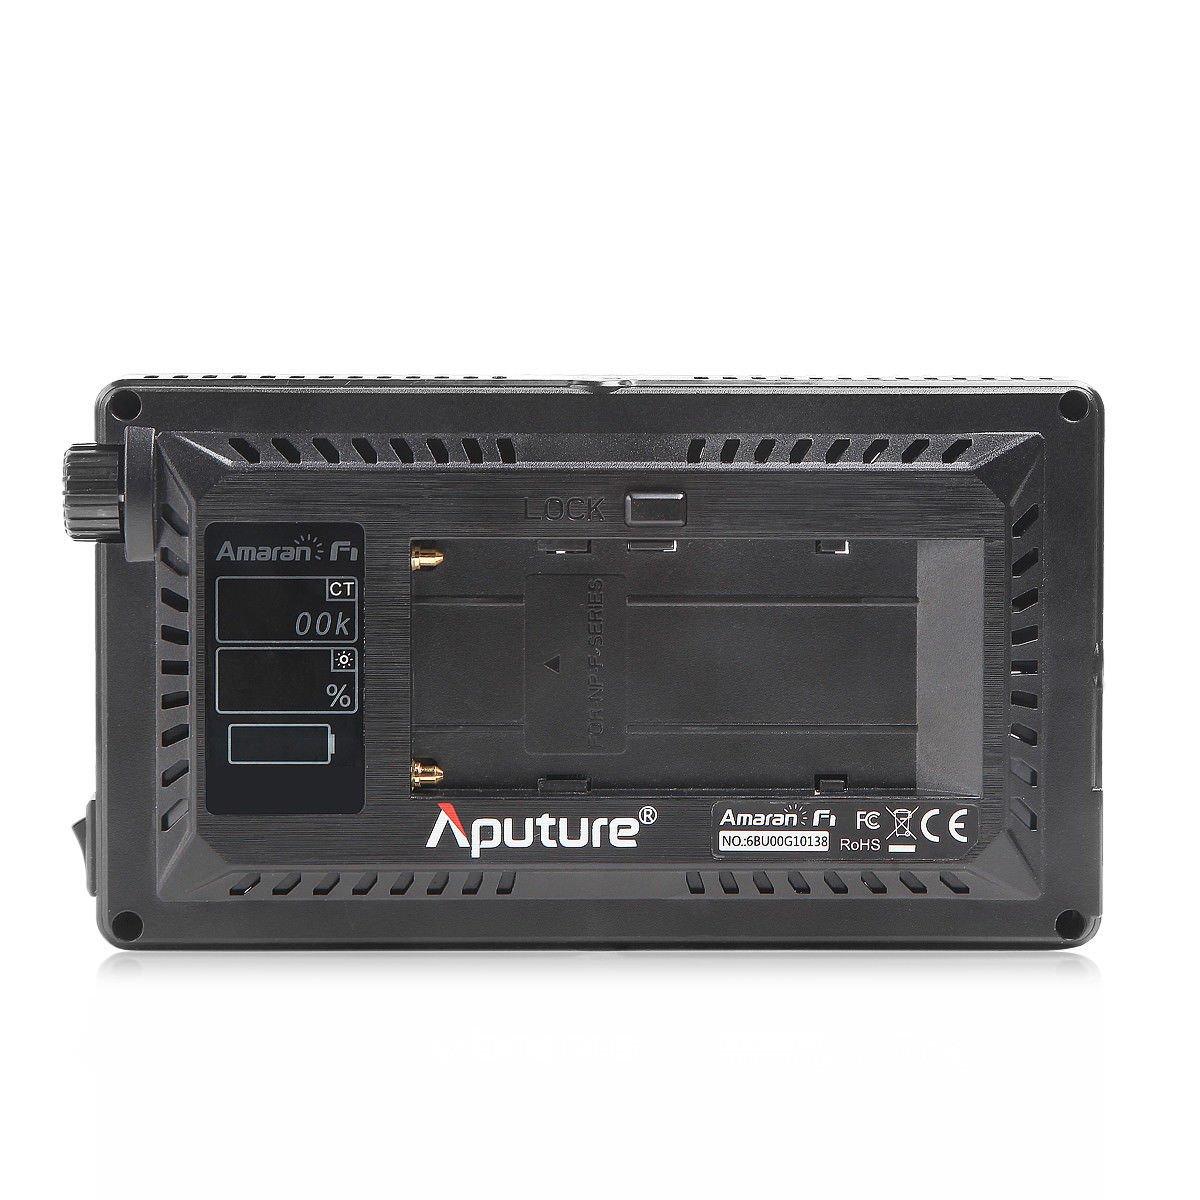 Aputure Amaran AL-F7 3200-9500K CRI/TLCI 95 LED panel LED video camera light (Aputure H198 Upgrade Version) with DigiKit cleaning cloth by Aputure (Image #4)